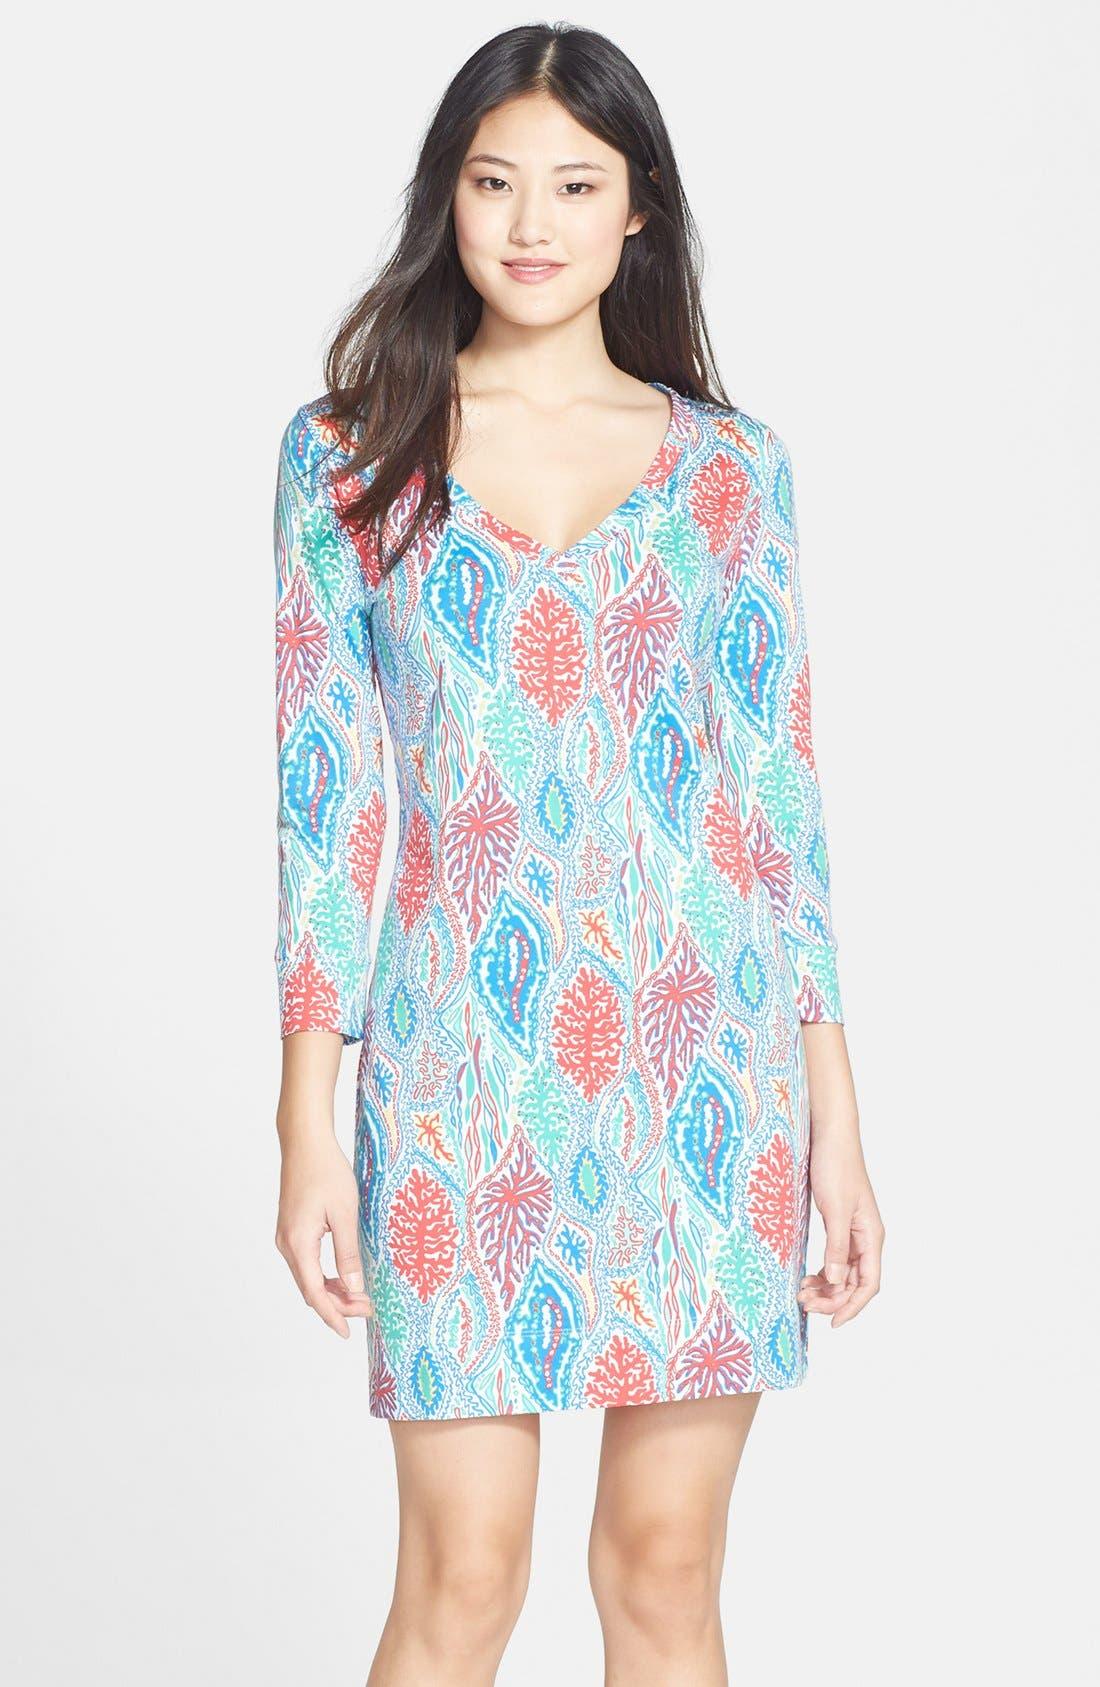 Alternate Image 1 Selected - Lilly Pulitzer® 'Christie' Print V-Neck Shift Dress